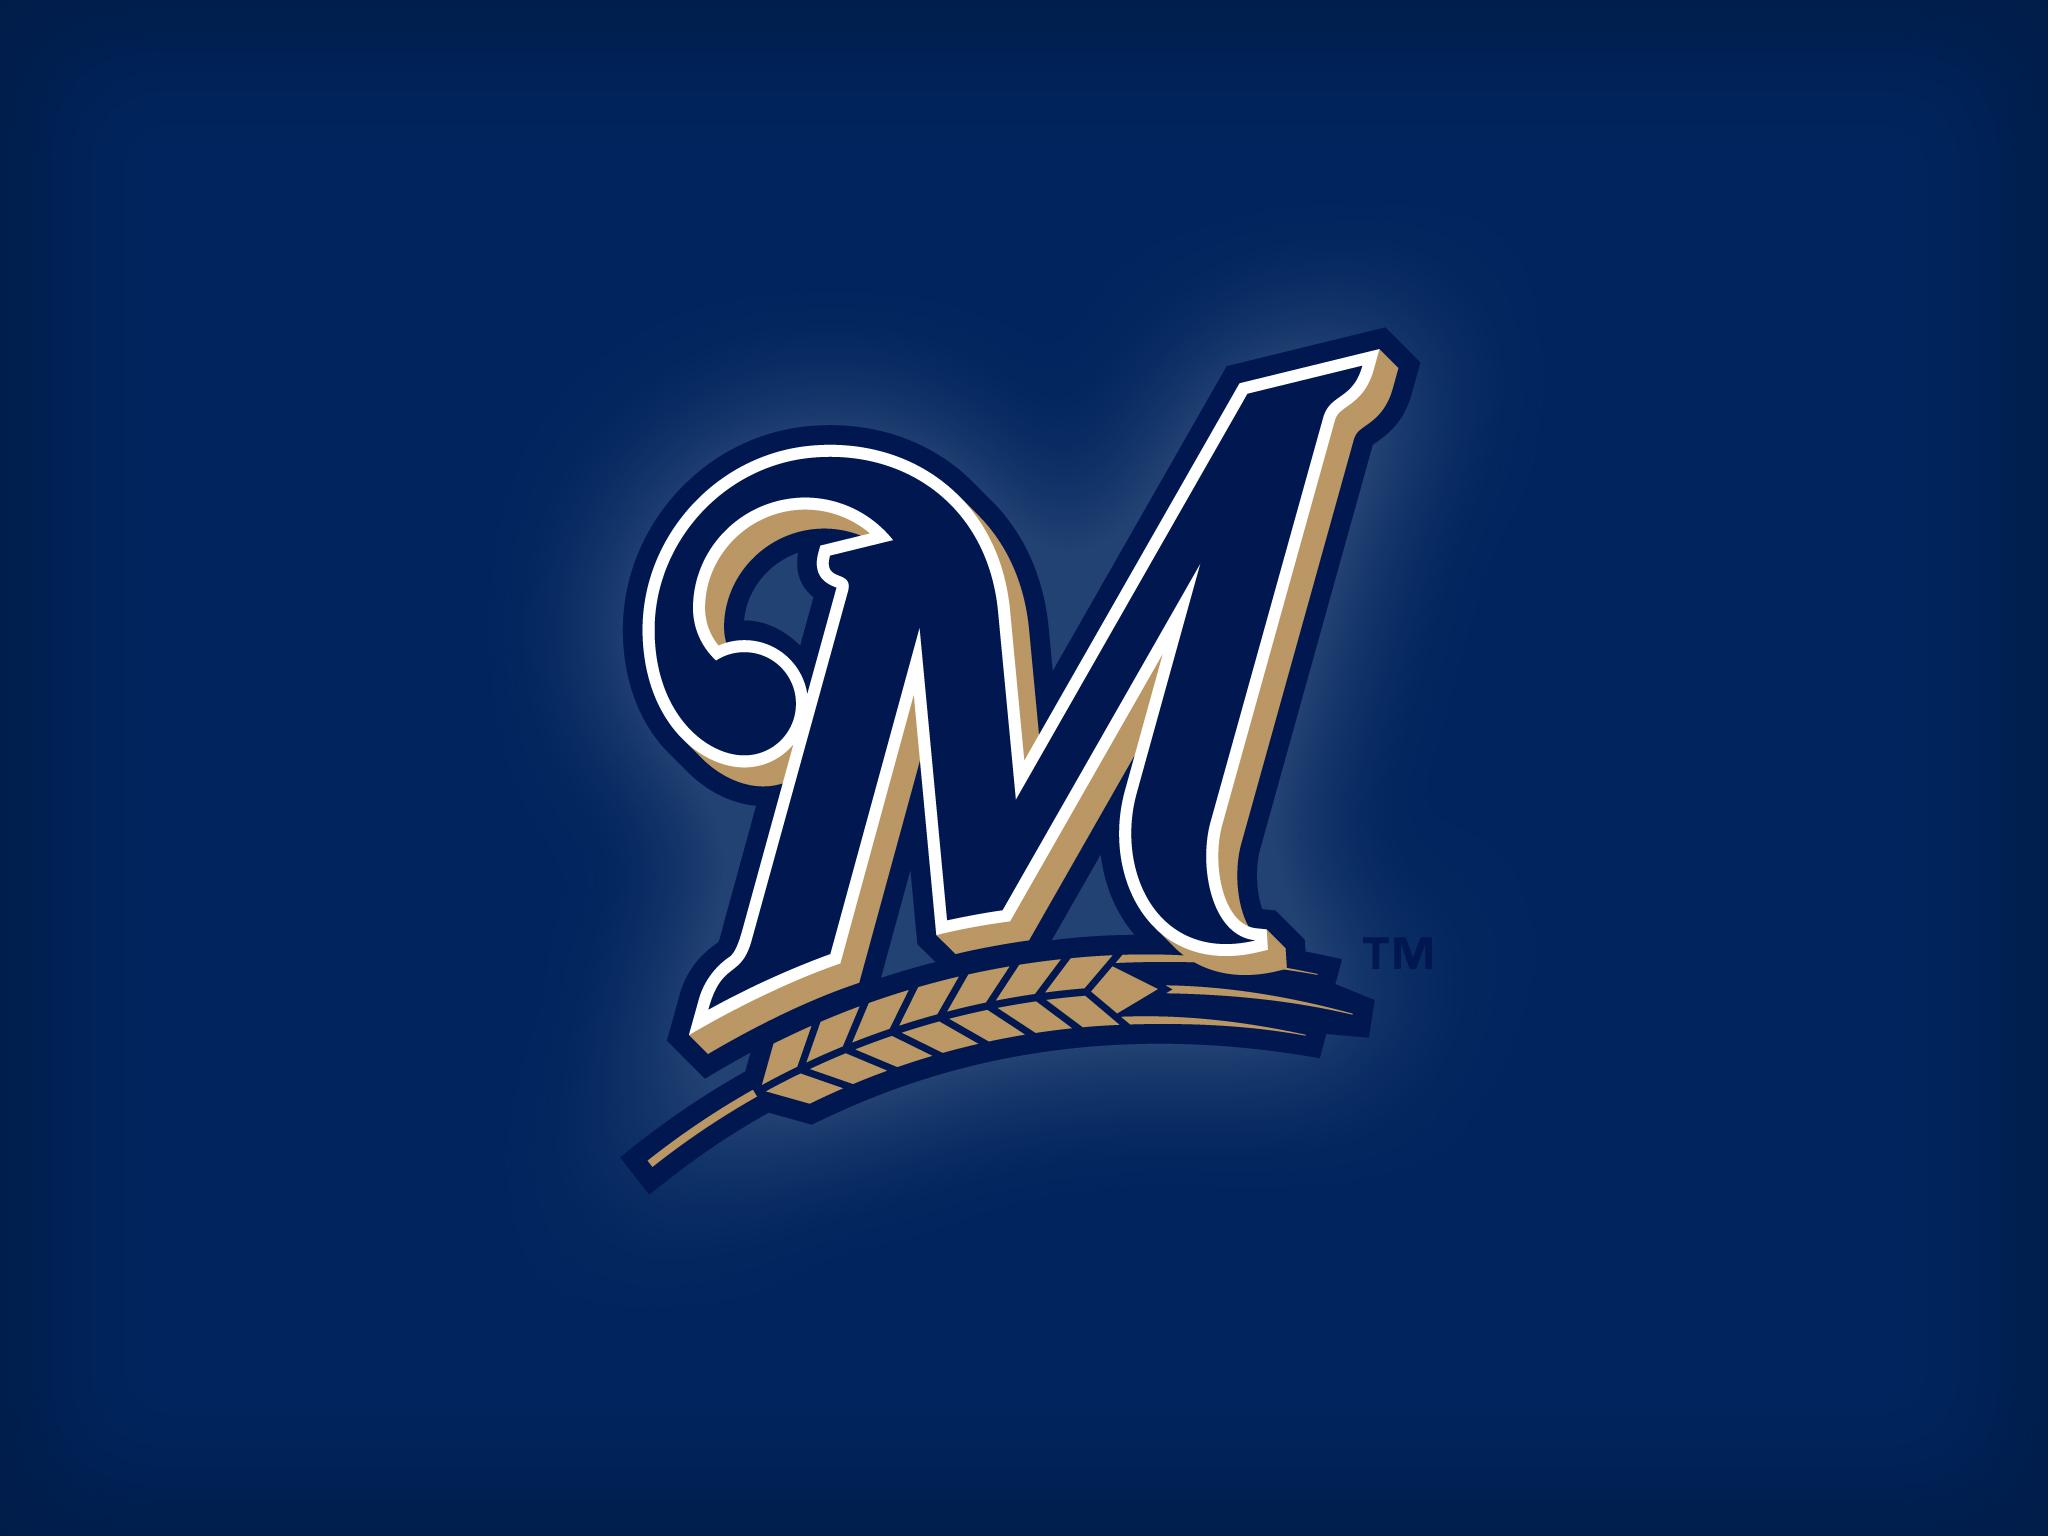 74360 скачать обои Спорт, Milwaukee Brewers, Бейсбол, Команда, Логотип - заставки и картинки бесплатно